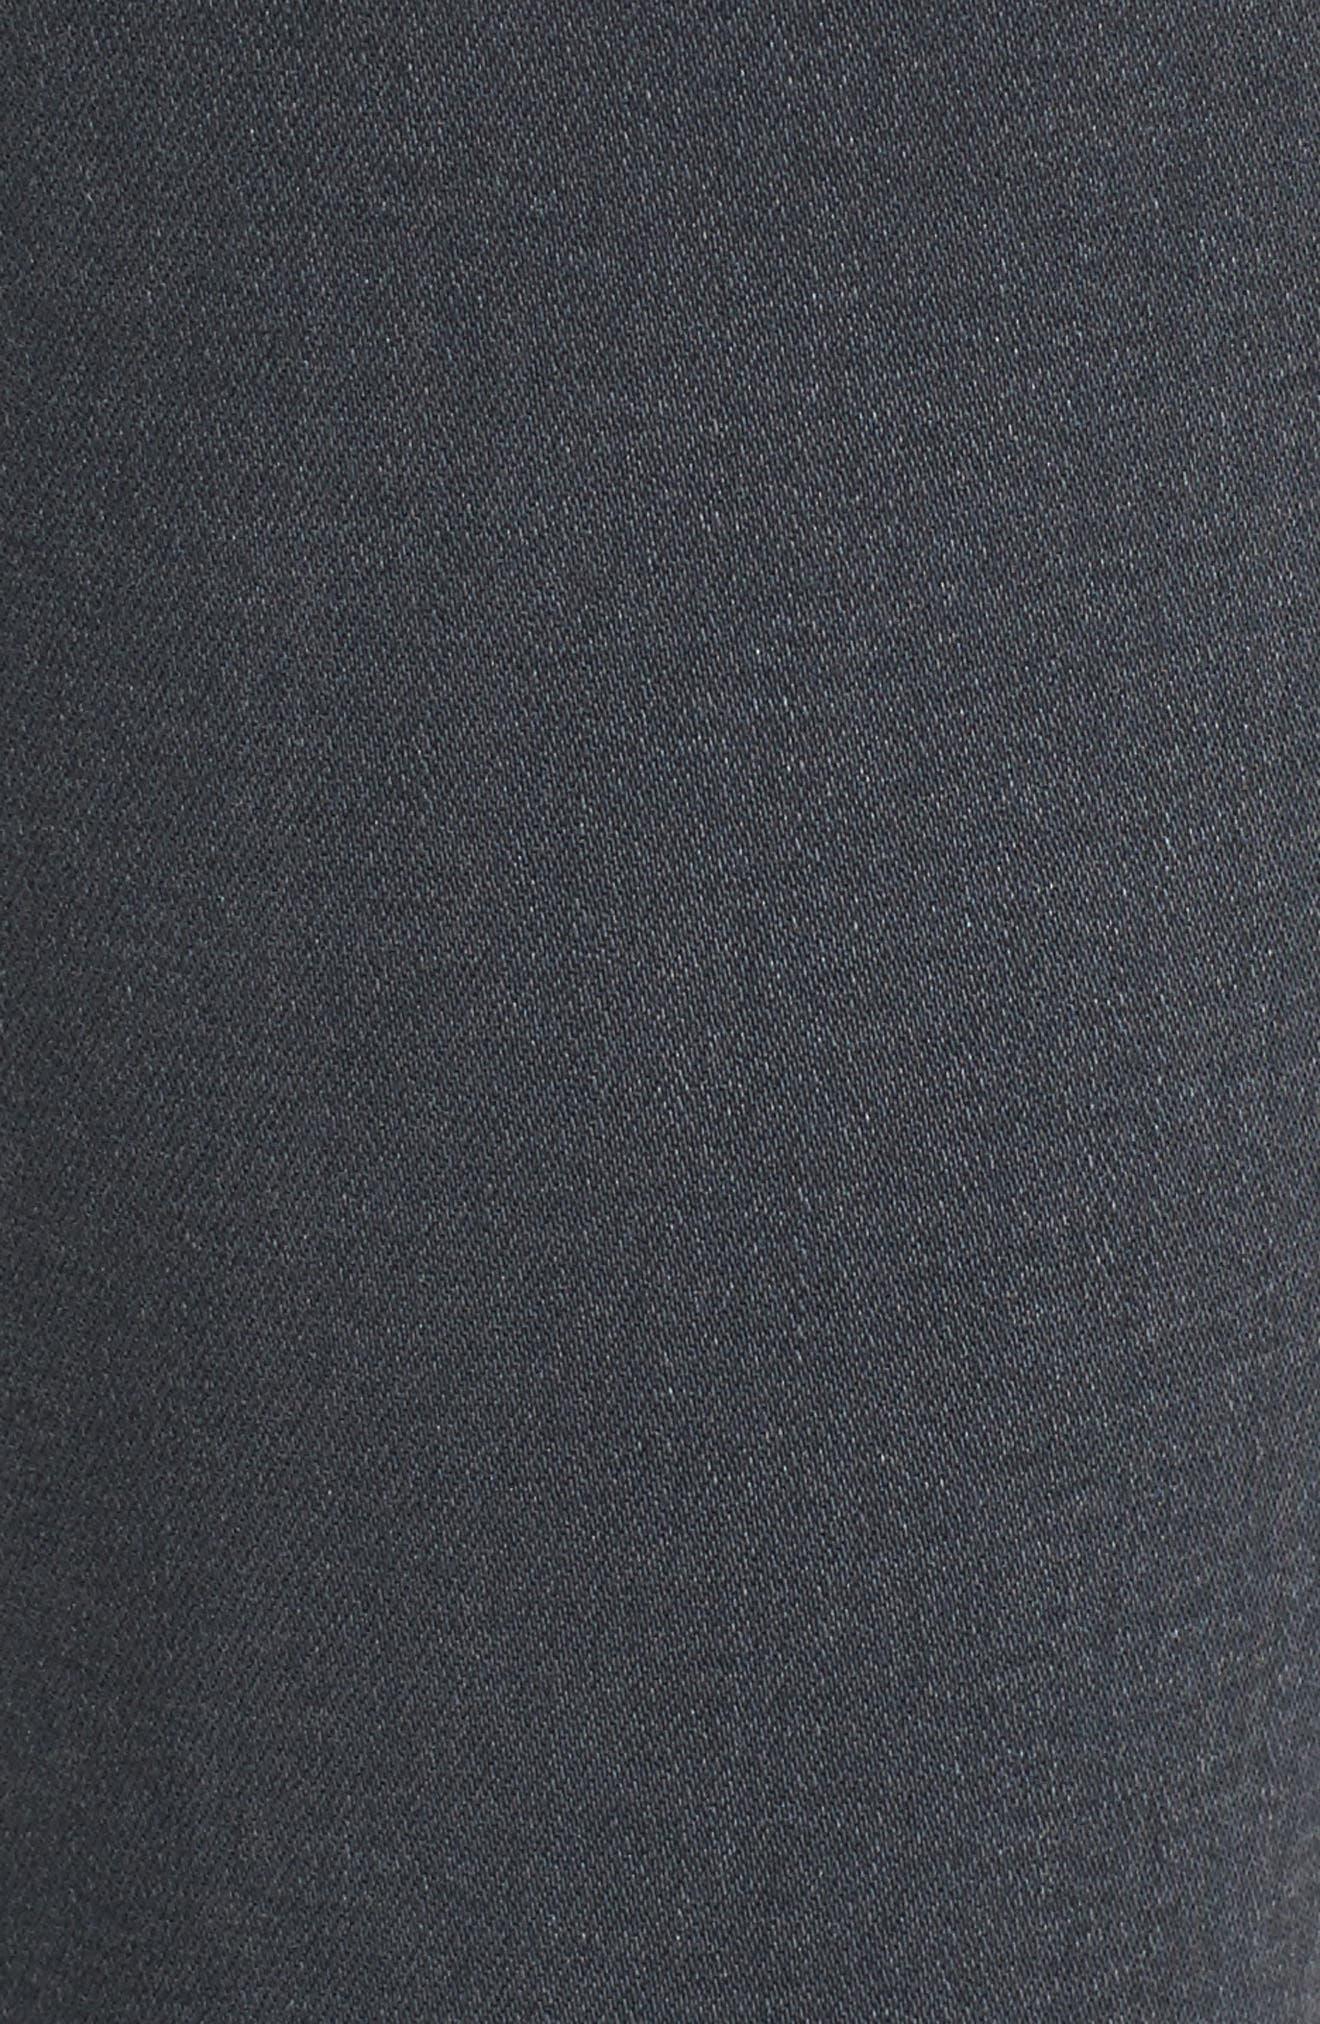 Ankle 'The Legging' Super Skinny Jeans,                             Alternate thumbnail 6, color,                             Raven Plume